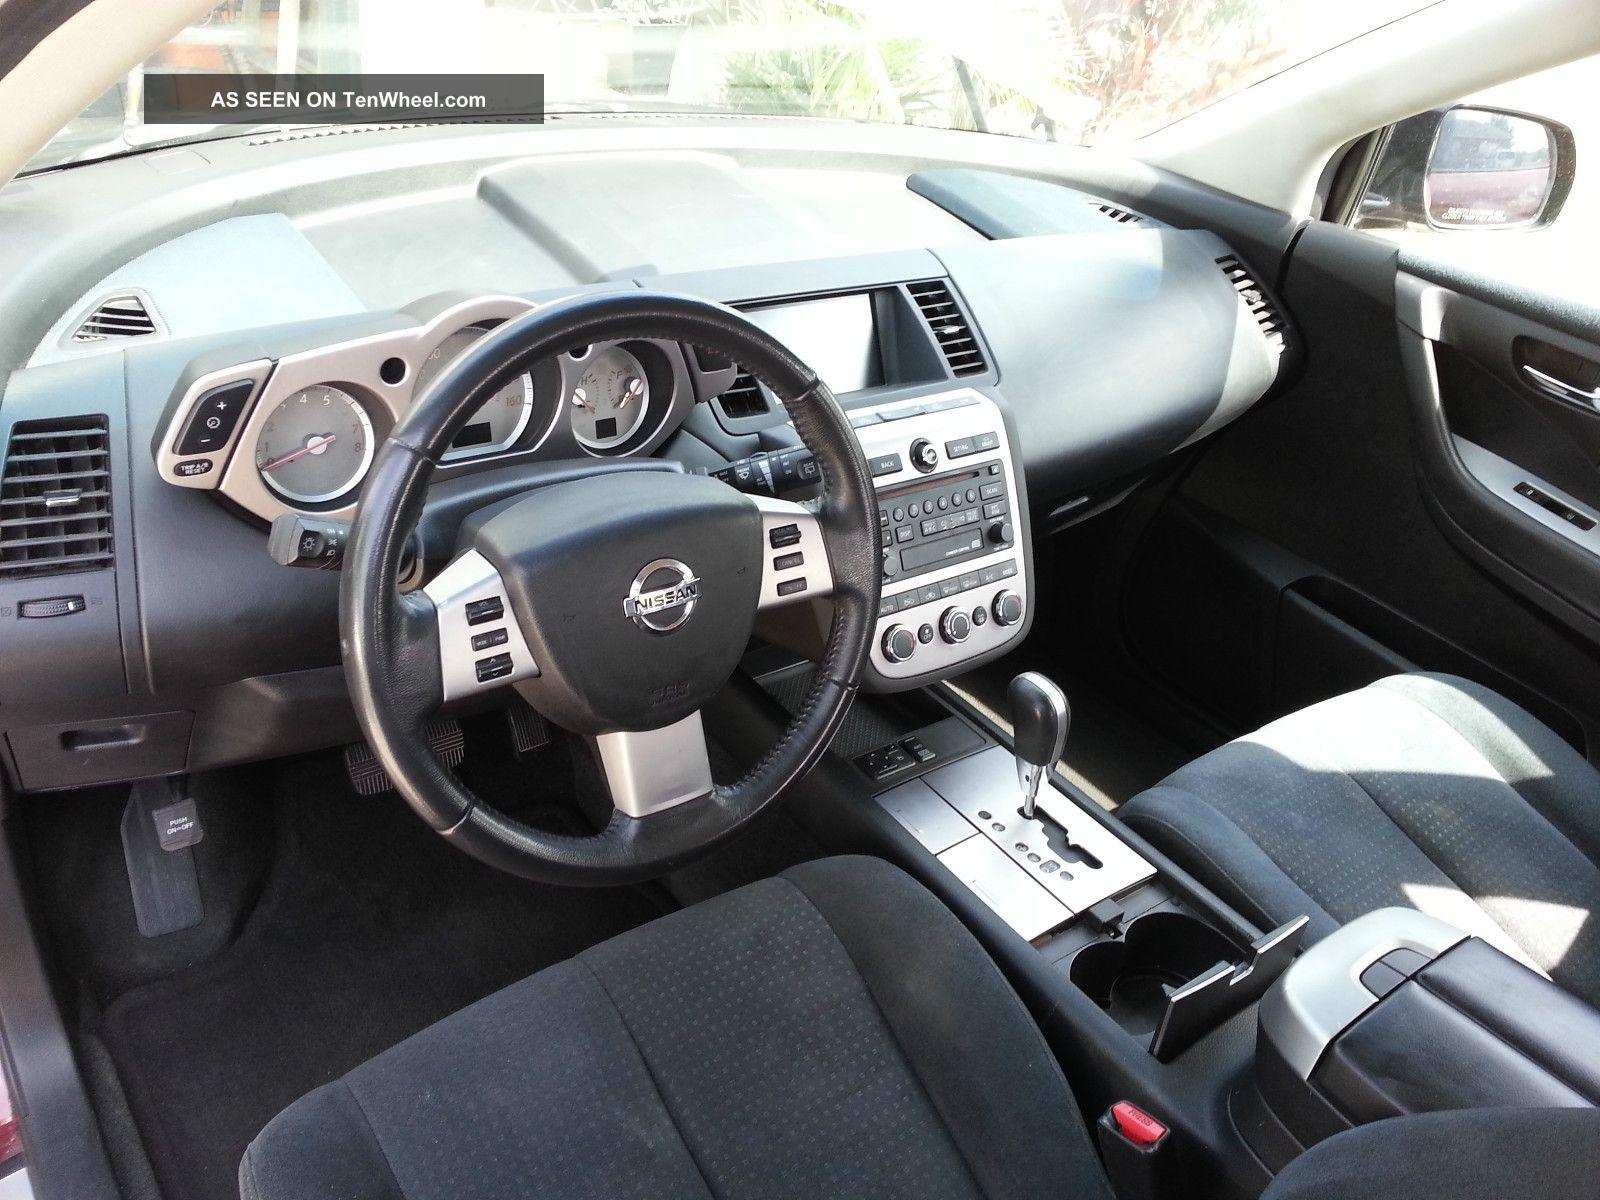 2006 Nissan Murano S Awd Title Maroon